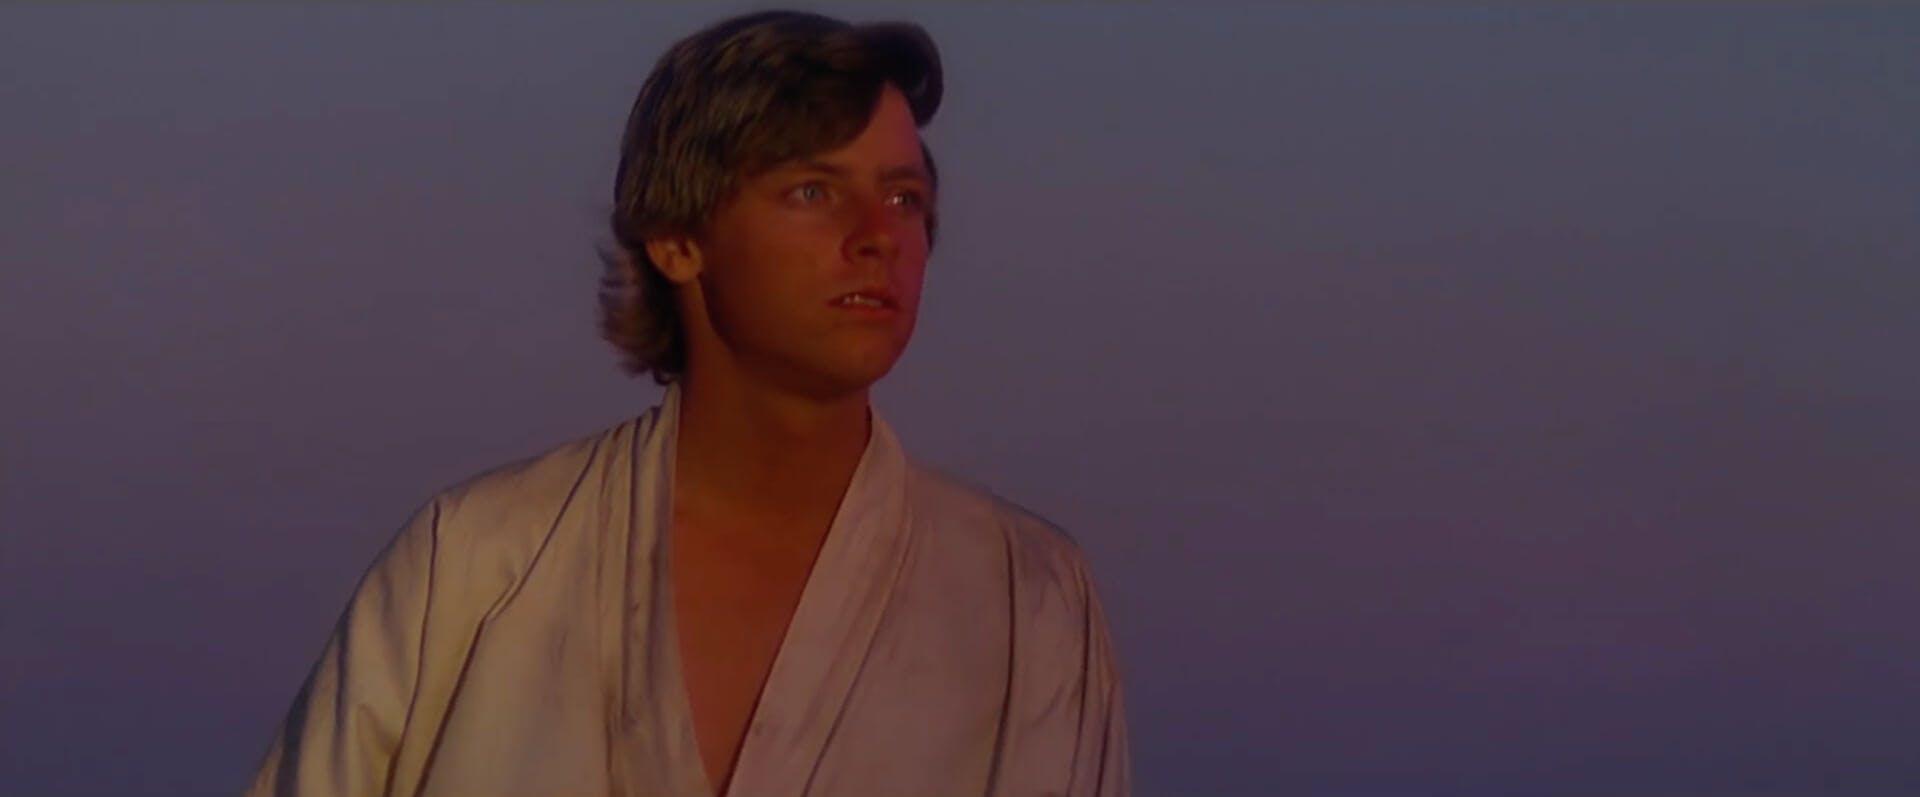 A New Hope - Luke Skywalker star wars movies